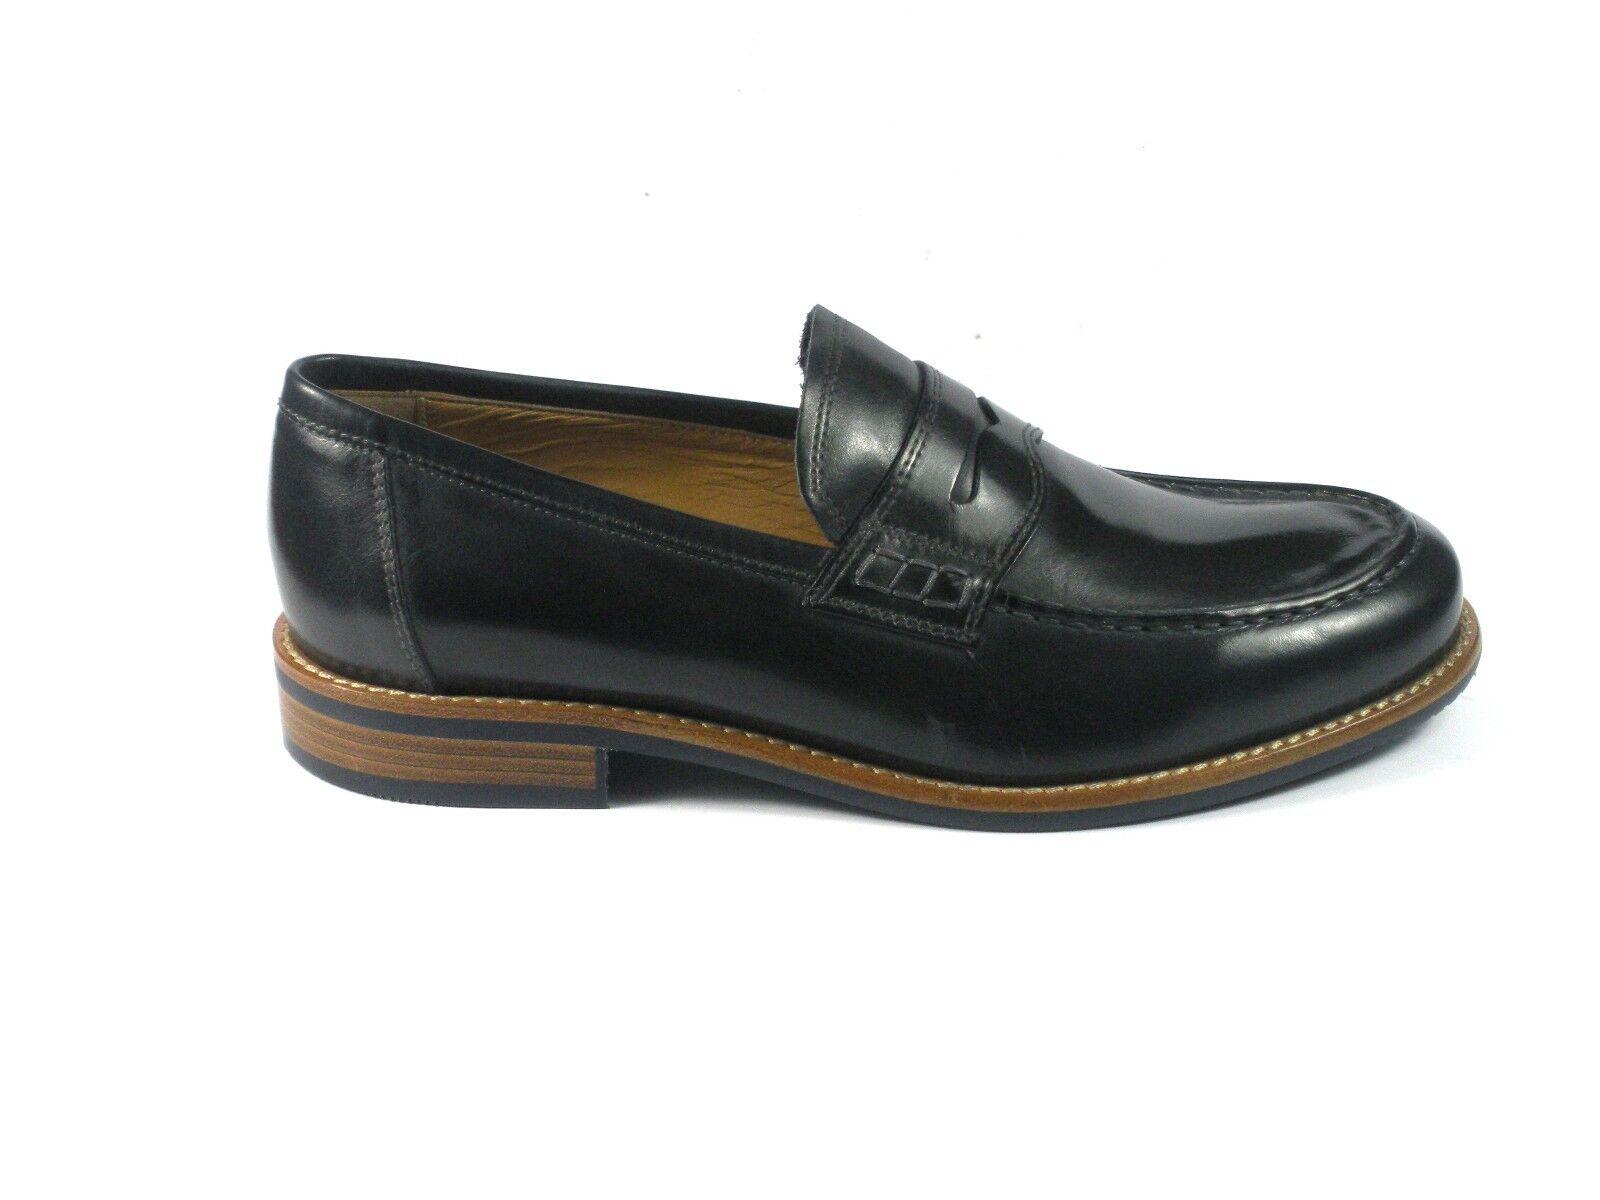 noir GIARDINI hommes chaussures P800195U MOCASSINI PENNY  PELLE bleu PRIM. ESTATE 2018